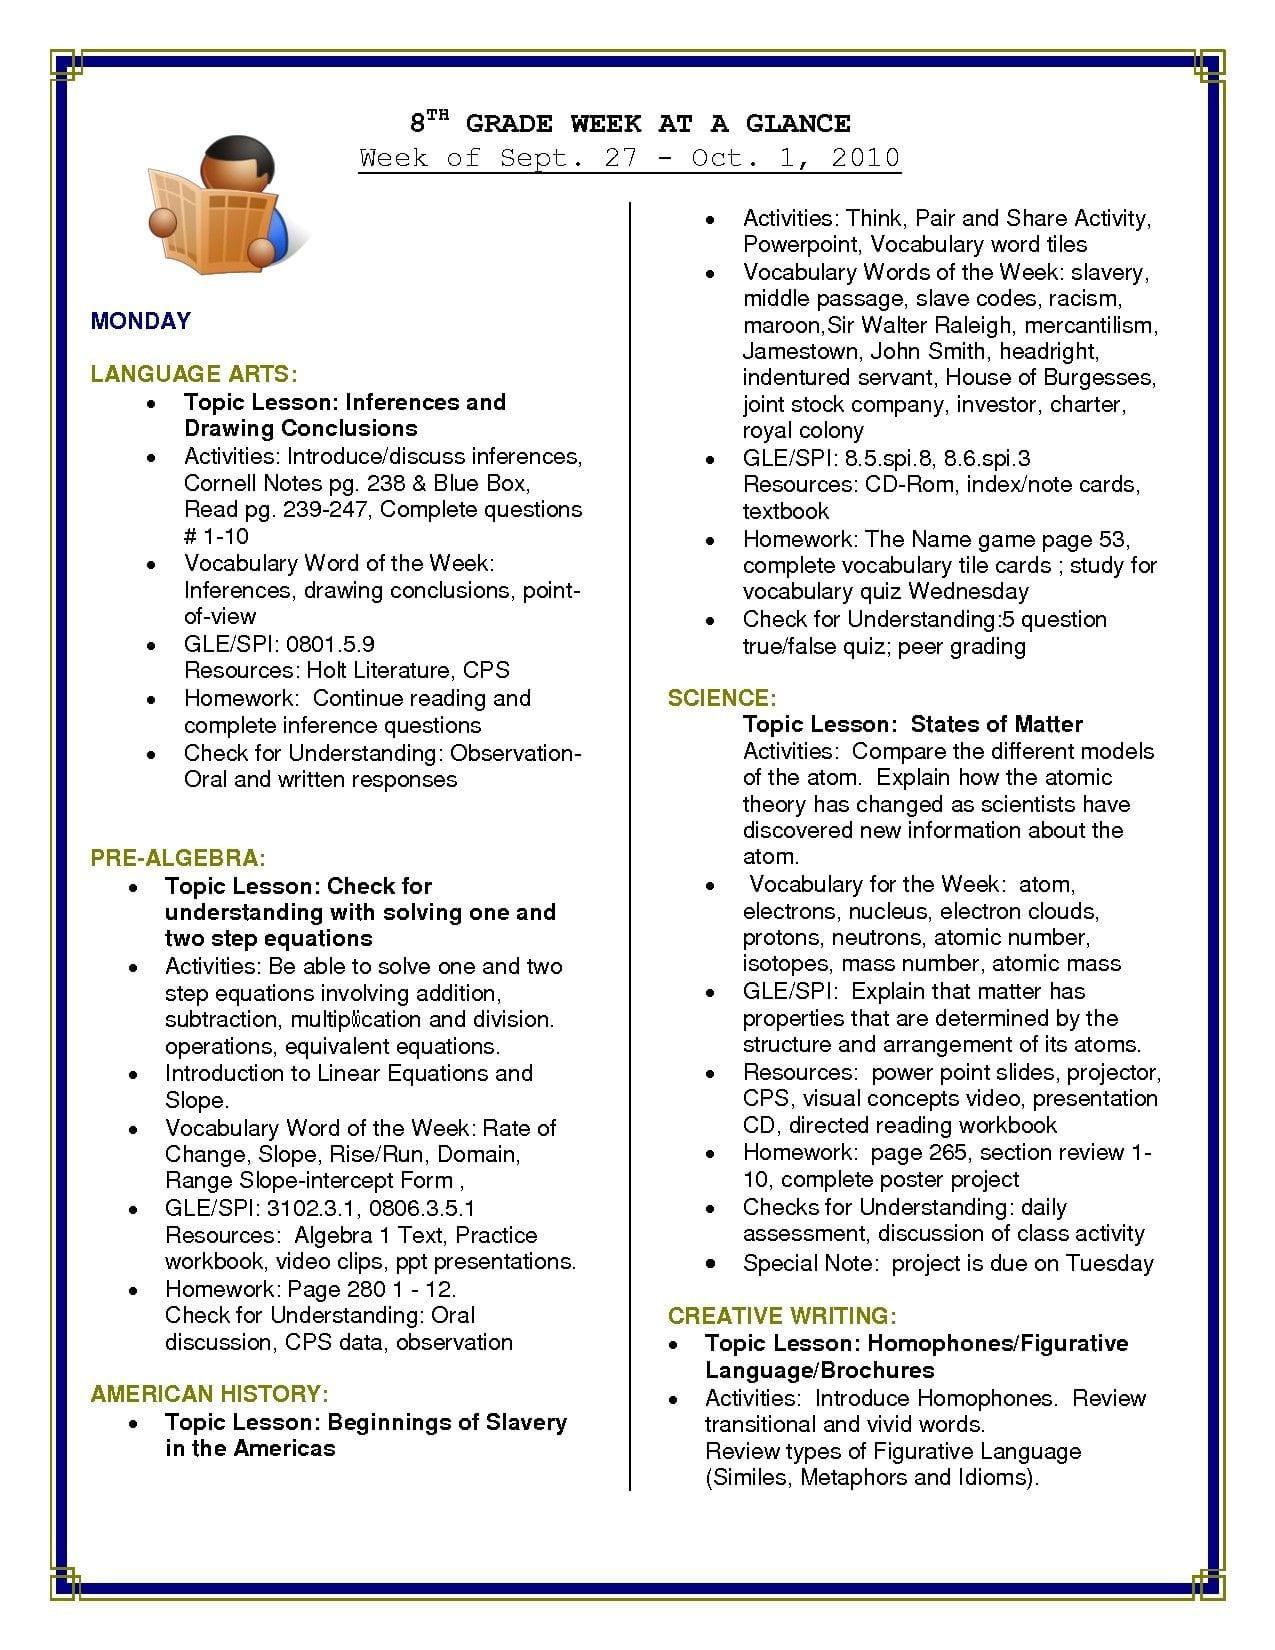 Free Printable 8th Grade Reading Comprehension Worksheets